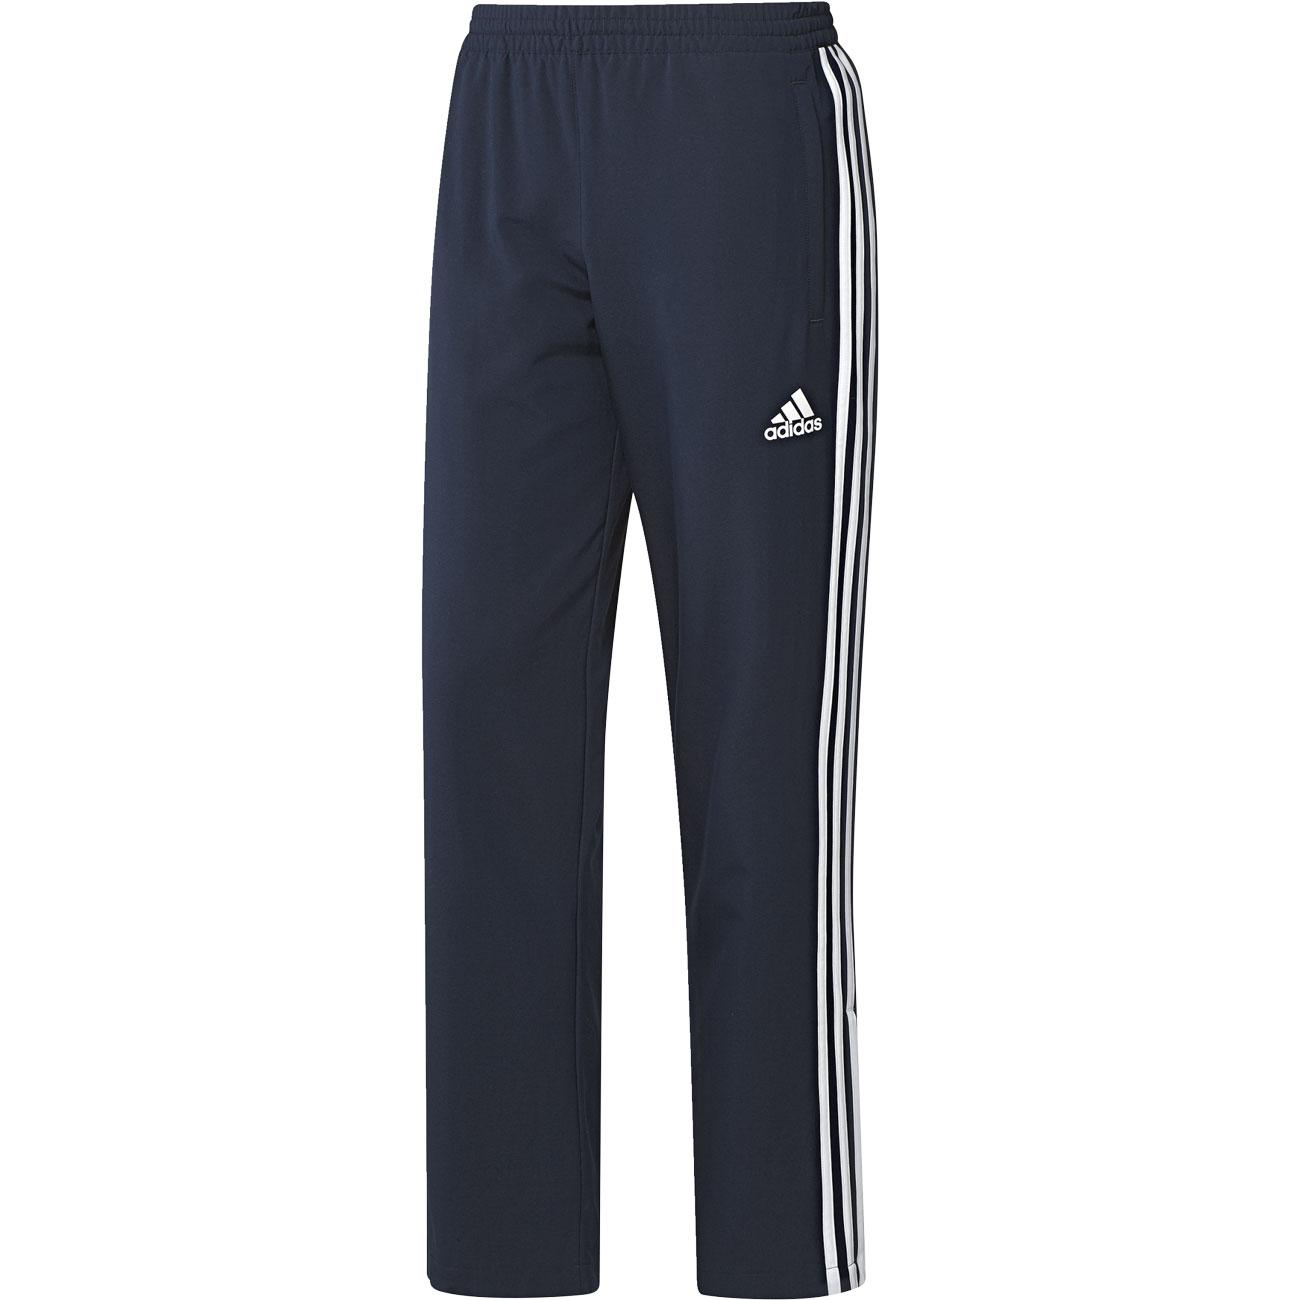 Adidas T16 Team Trainingshose Herren Hosen Kleidung